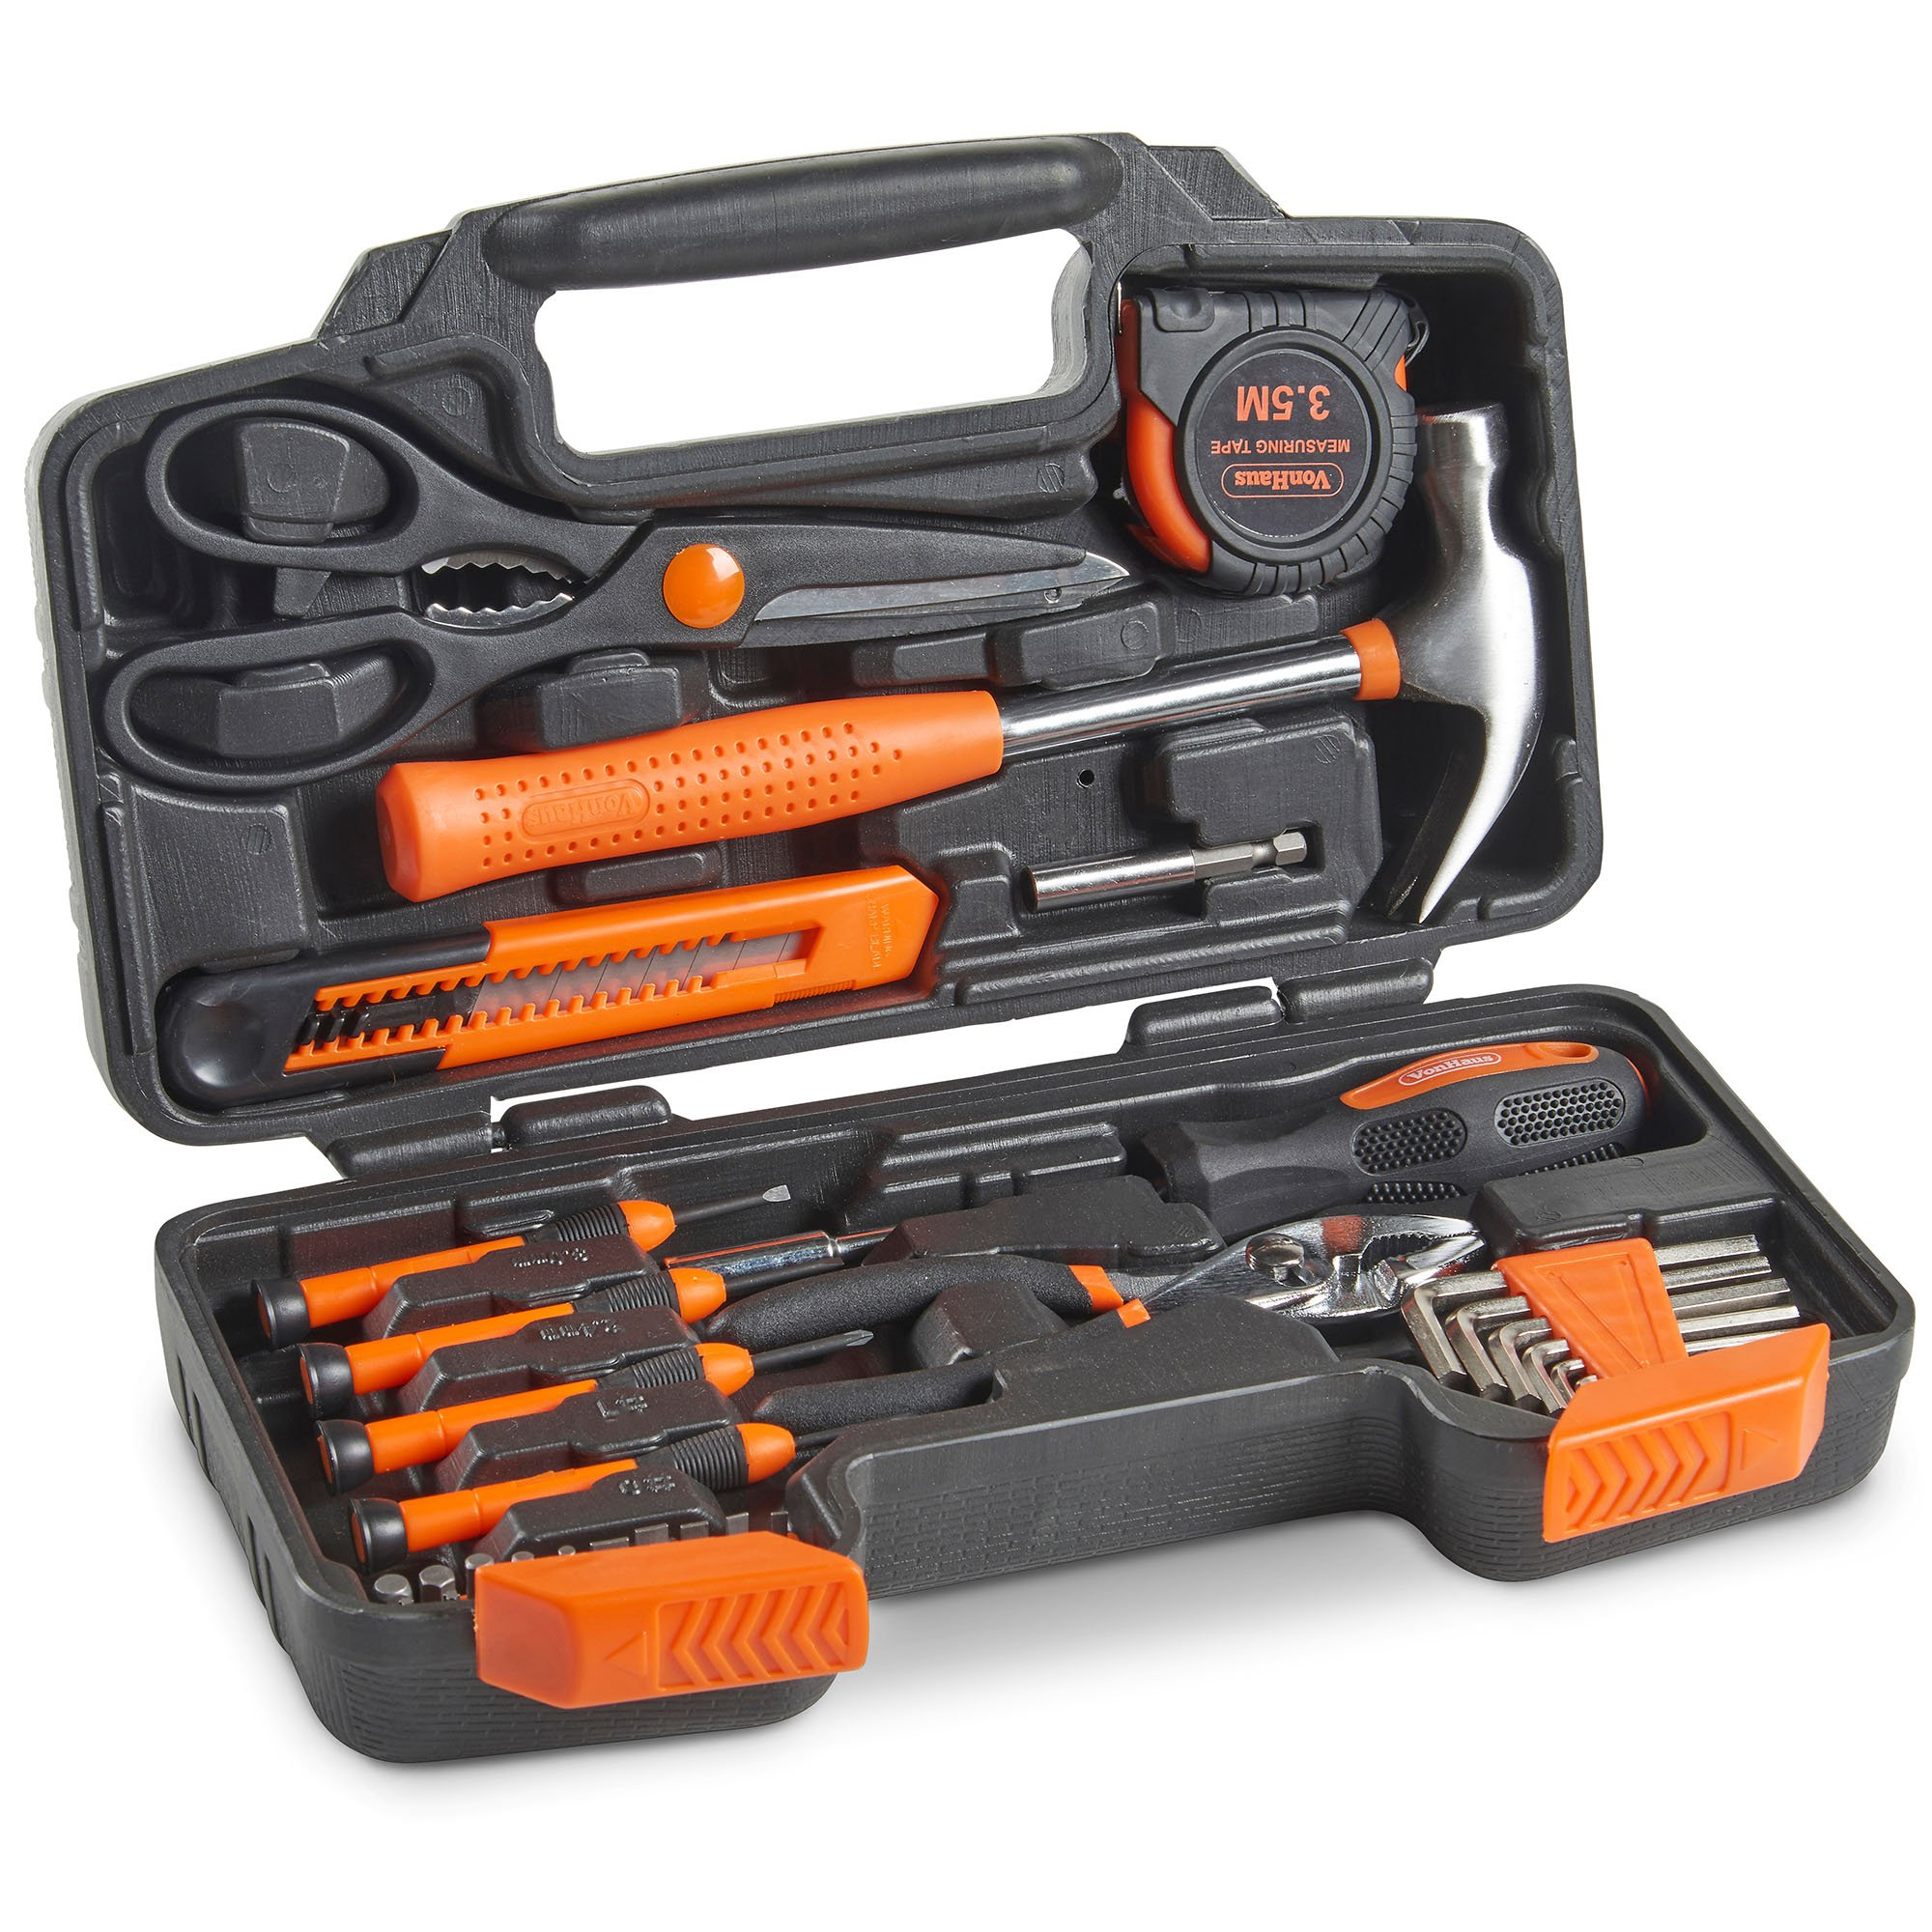 VonHaus Orange 39 Piece General Tool Set - Home Hand Tool Kit with Plastic Toolbox Storage Case